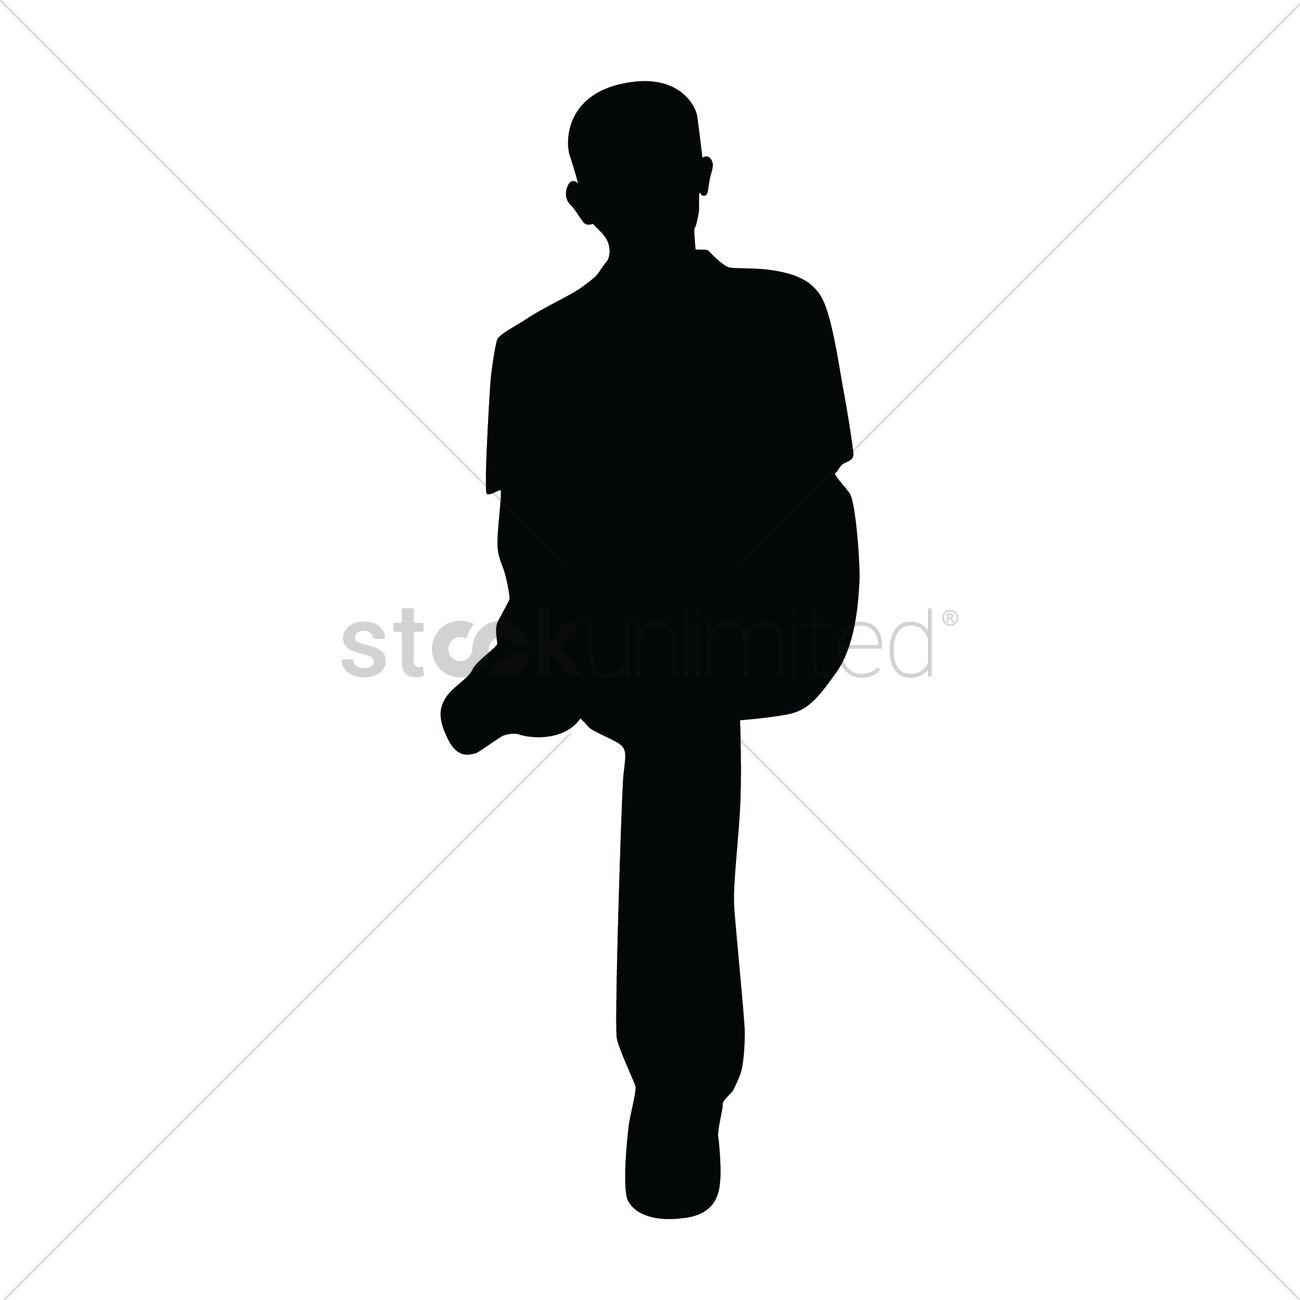 1300x1300 Shape Shapes Silhouette Silhouettes Cutout Cut Out Man Men Guy